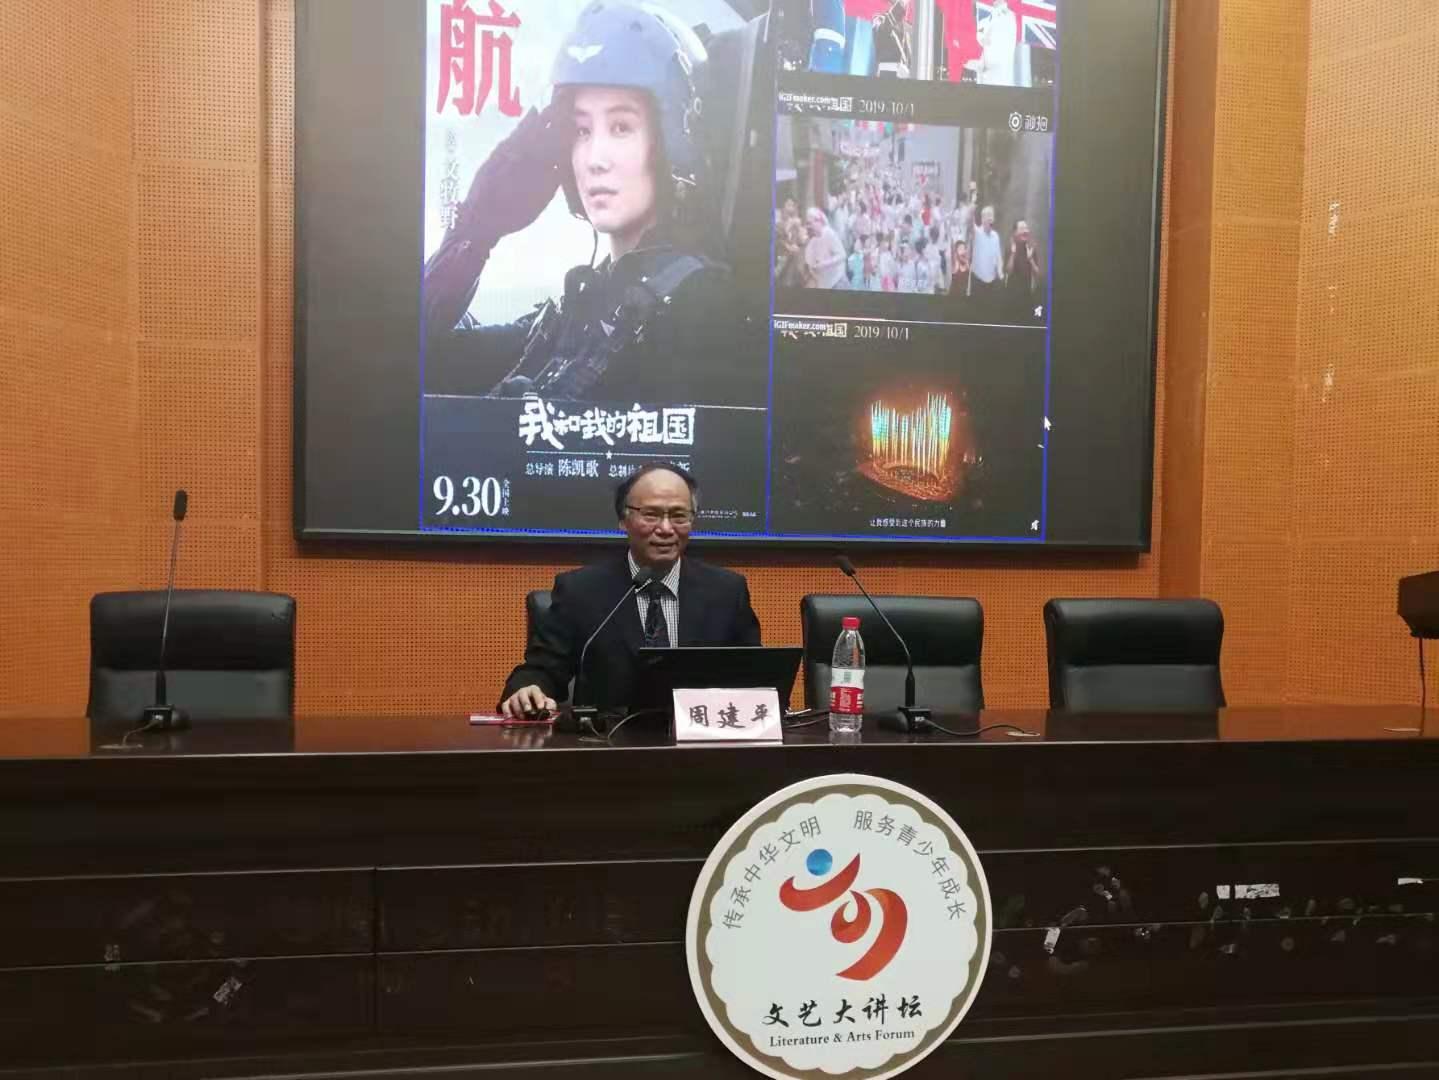 <b>周建平博士在四川文理学院讲授新时代文化思想</b>